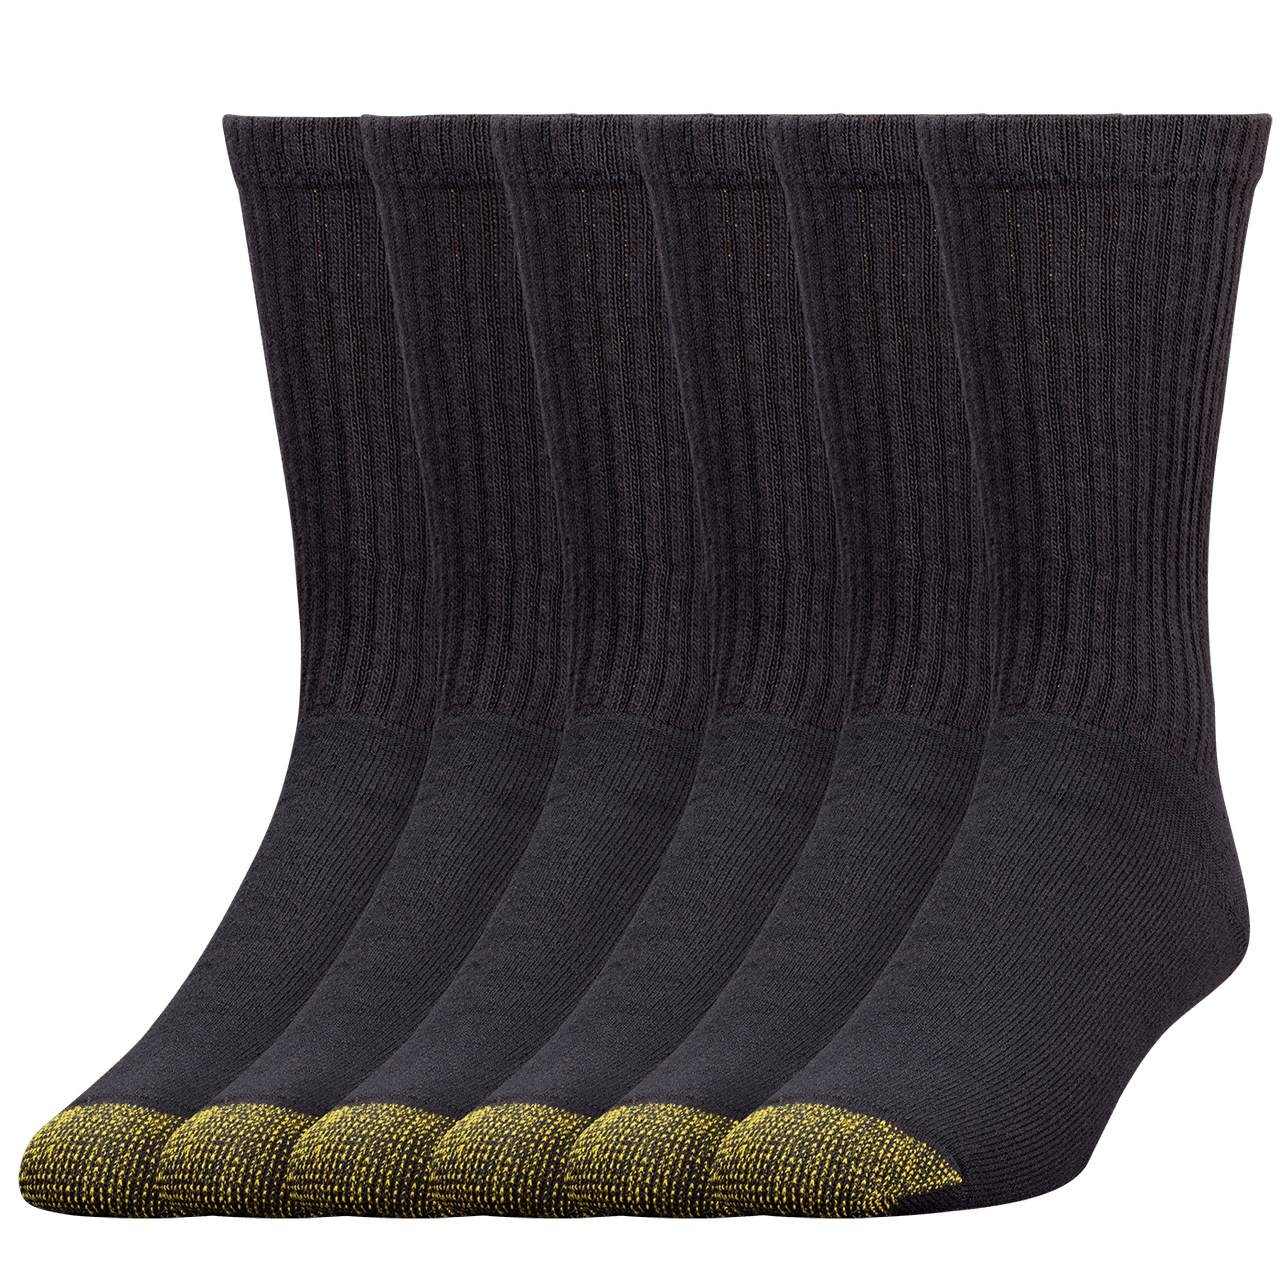 Gold Toe Mens 656p Cotton Quarter Athletic Socks Multipack